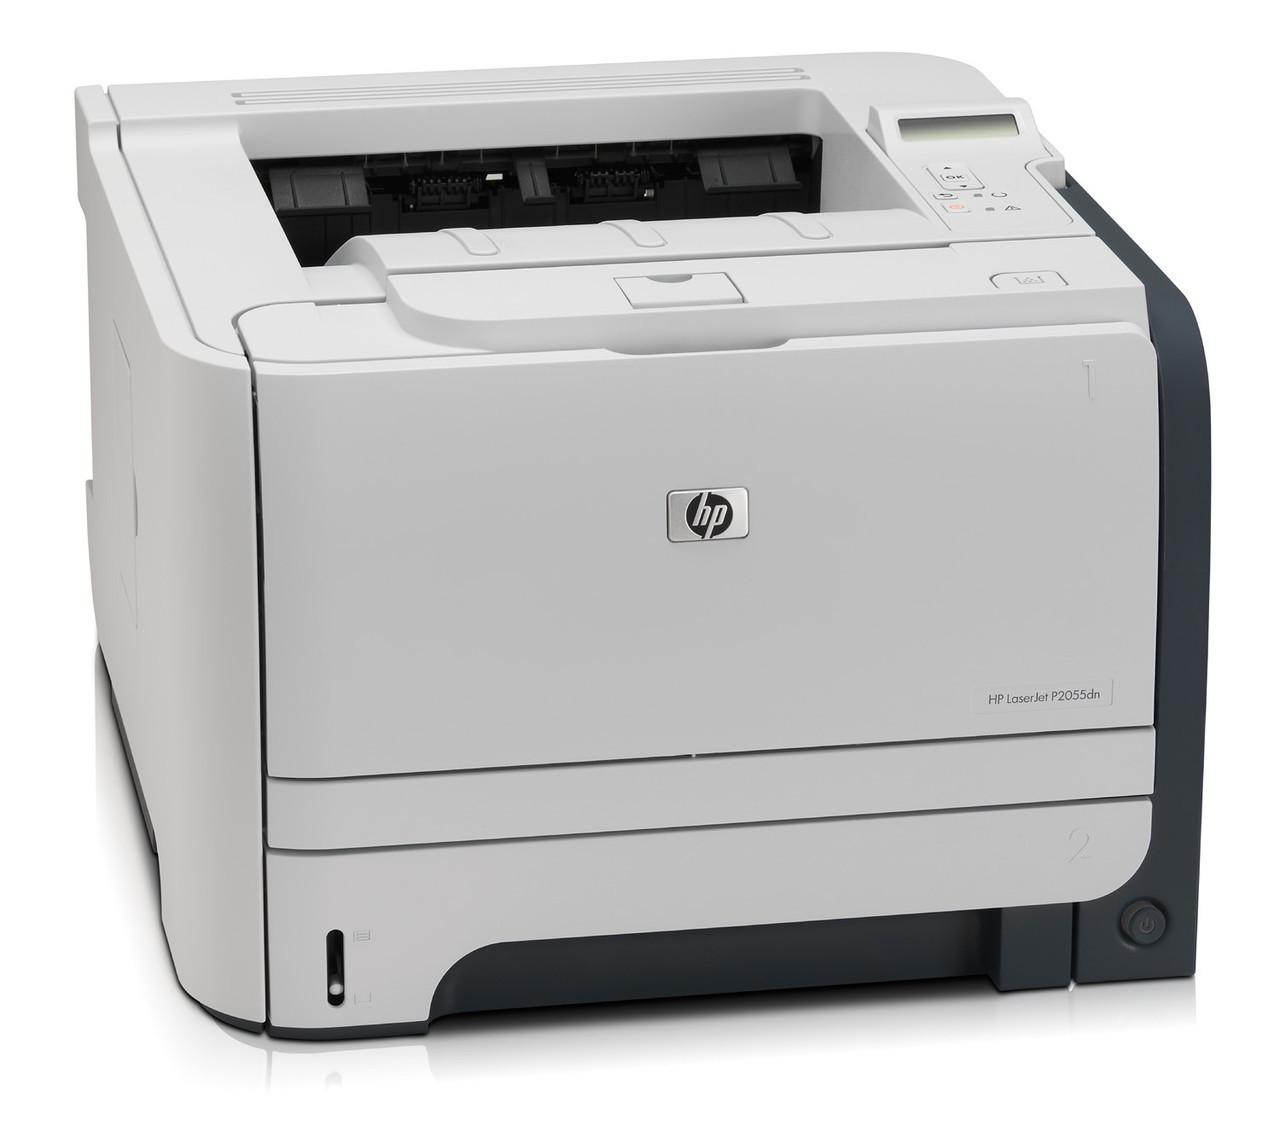 HP Laserjet P2055dn - CE459A - HP 2055 HP Printer for sale